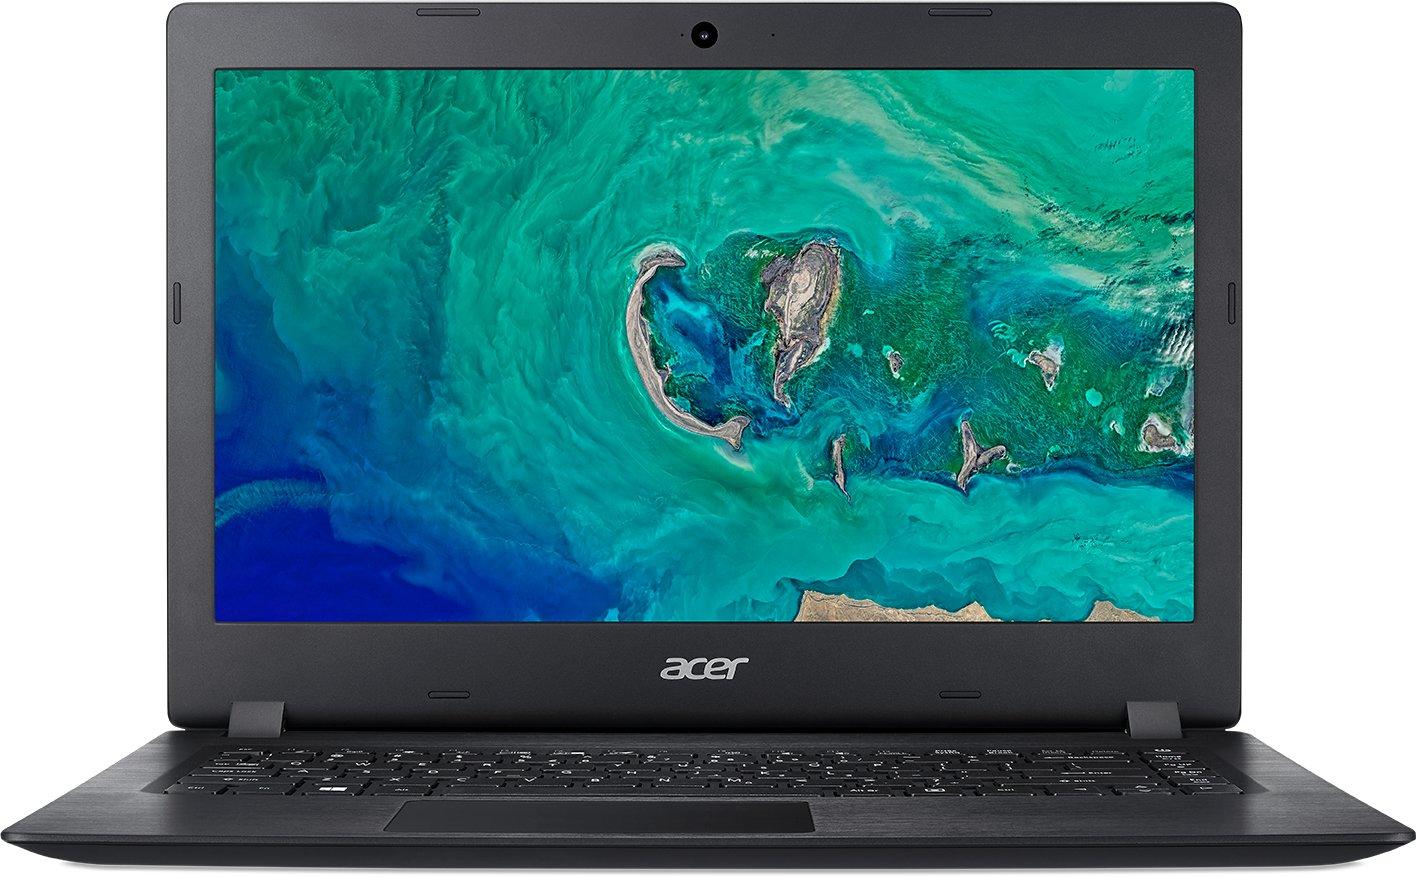 "Acer Aspire 1 - 14""/N4100/4G/64GB/W10S černý + Office 365 Personal"